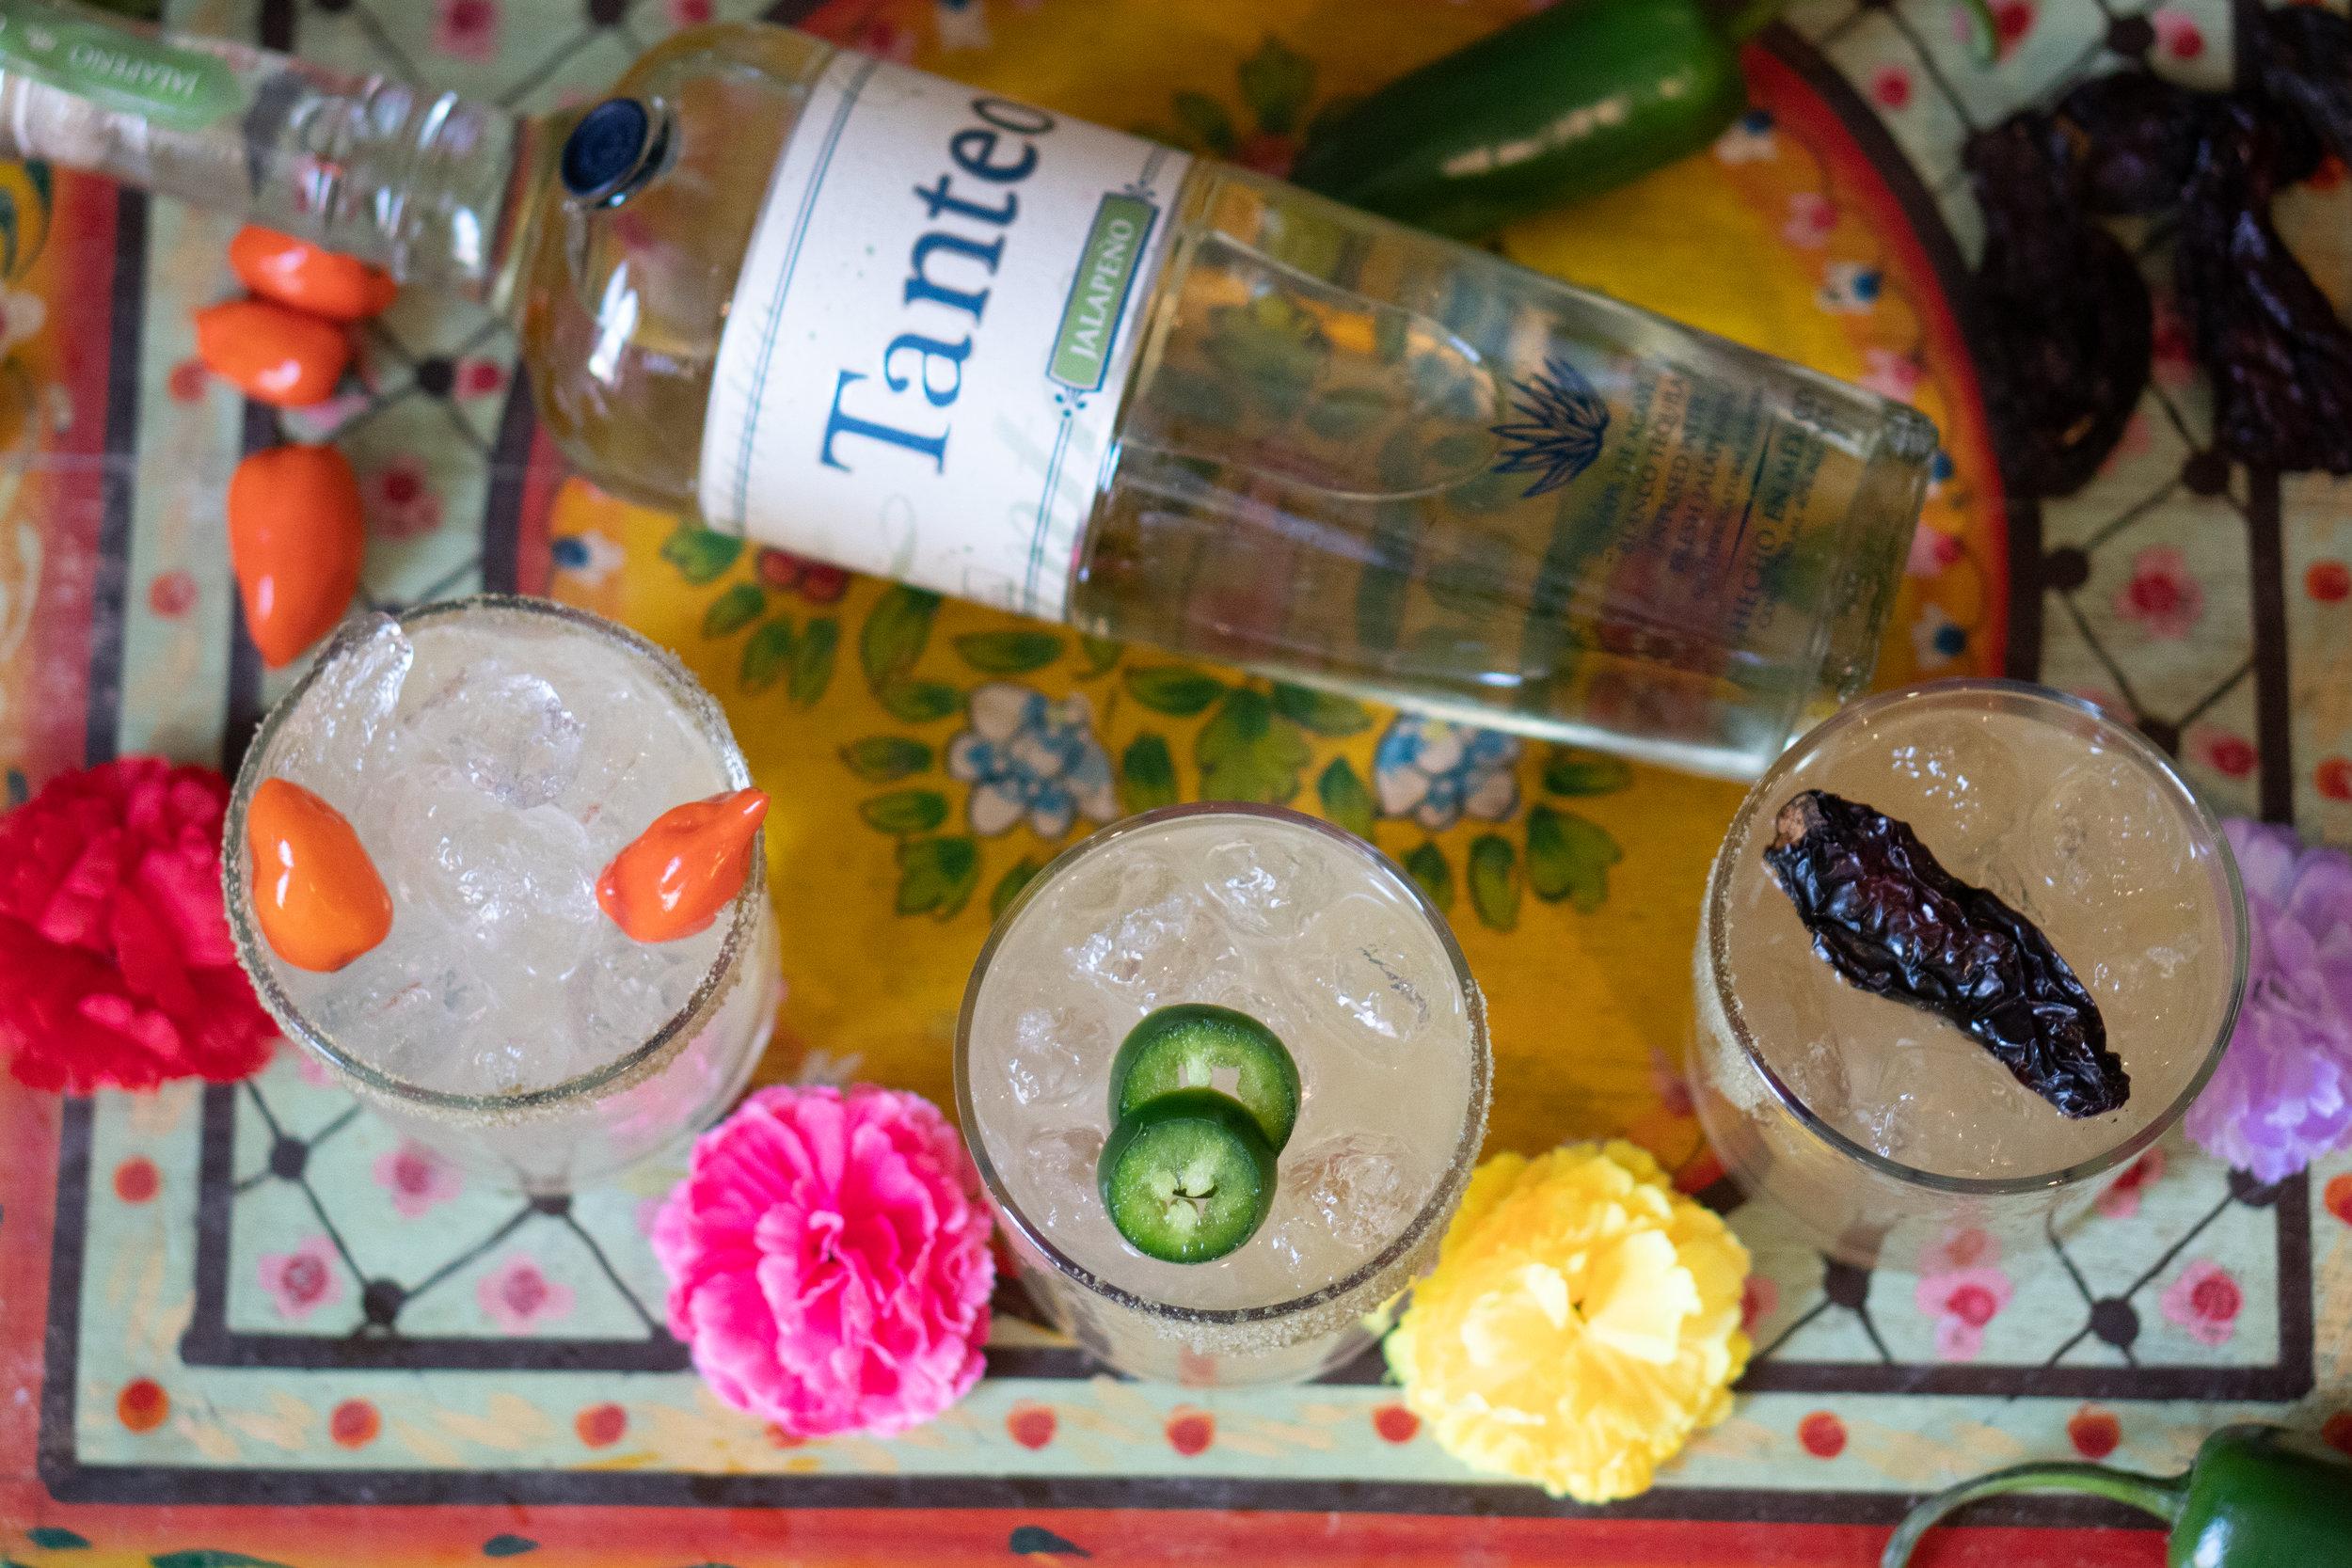 In a Cocktail   2 oz.  Tanteo Jalapeño Tequila   1 oz. Fresh Lime Juice  ¾ oz. Agave Nectar  Rim with  Tanteo Jalapeño Salt    In a Pitcher   12 oz.  Tanteo Jalapeño Tequila   8 oz. Fresh Lime Juice  4 oz. Agave Nectar  8 oz. Water